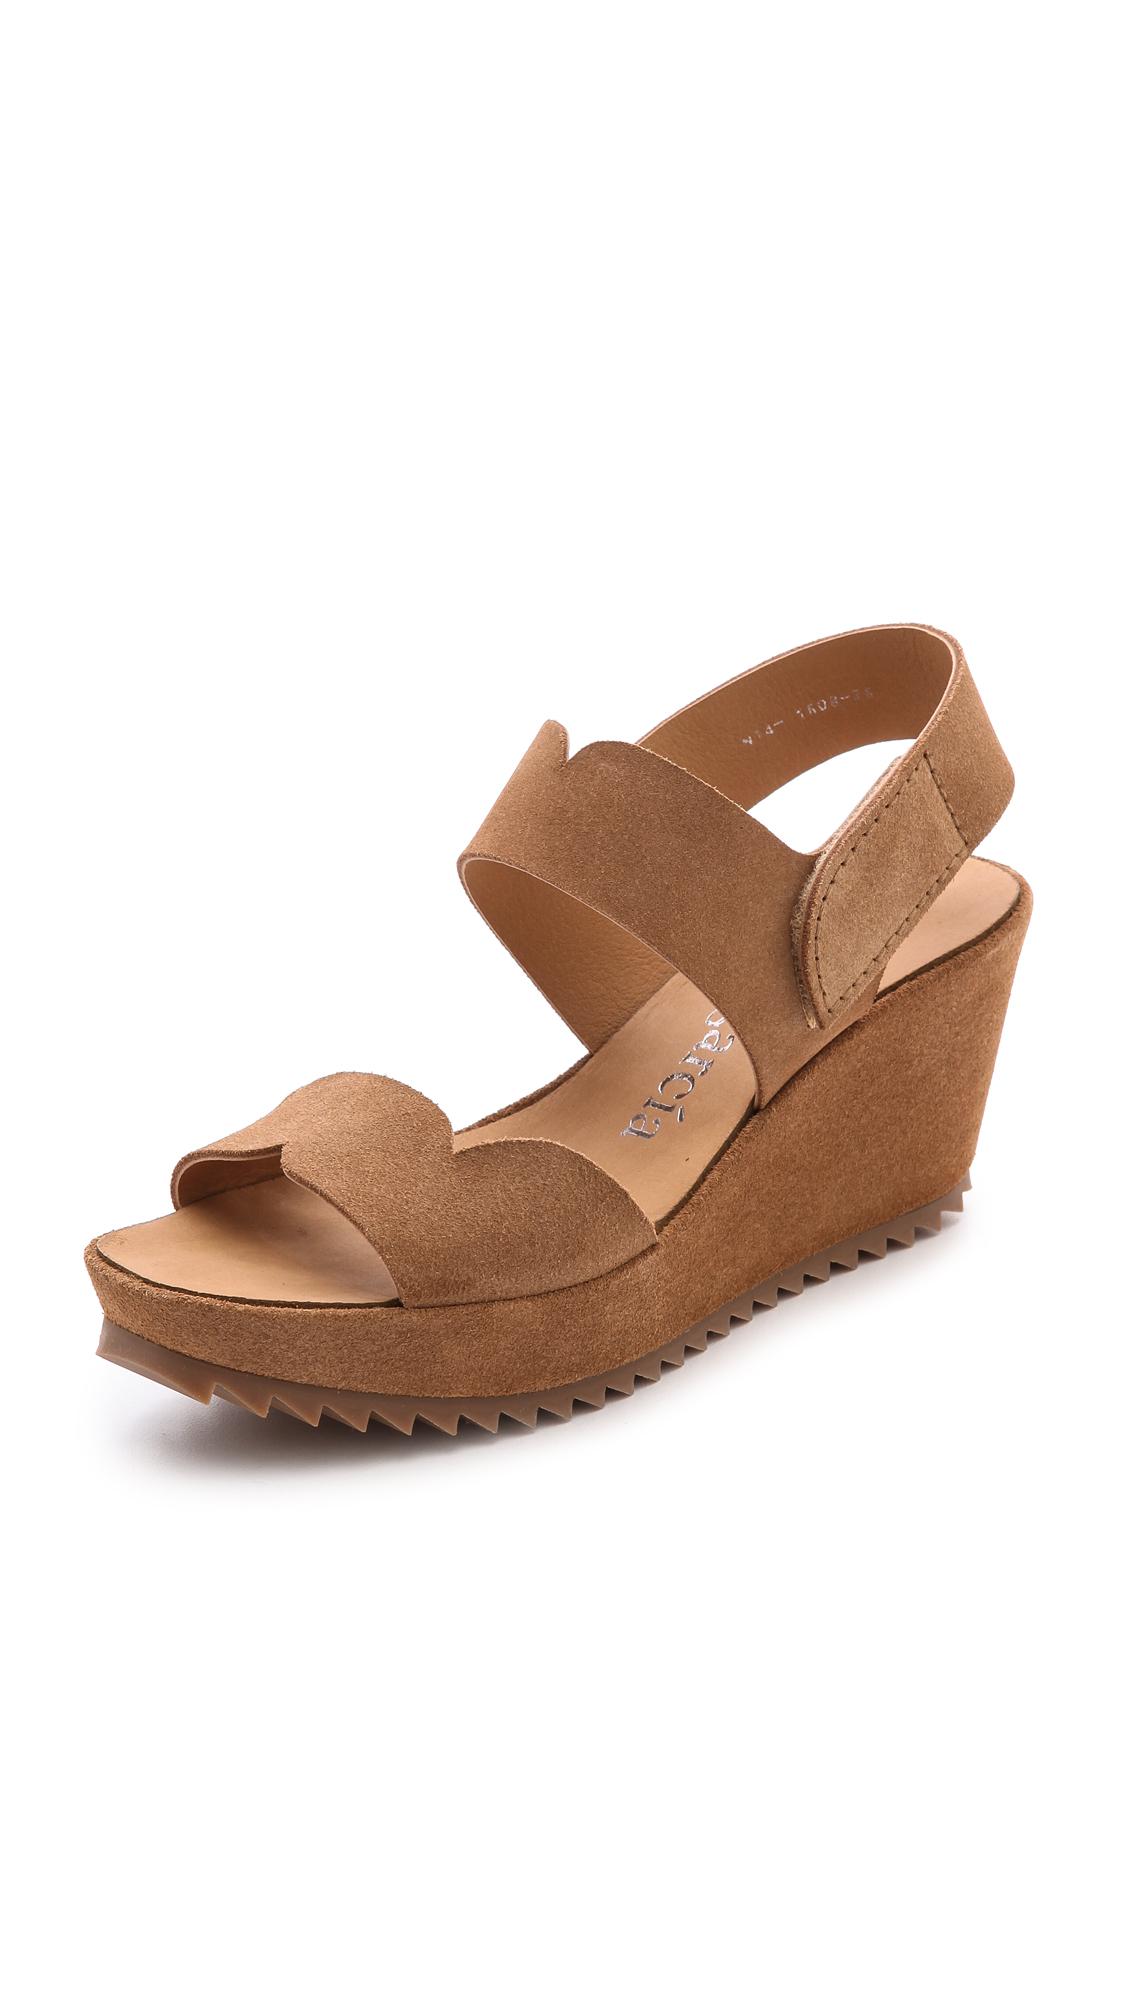 Sandals Tan Wedge Sandals